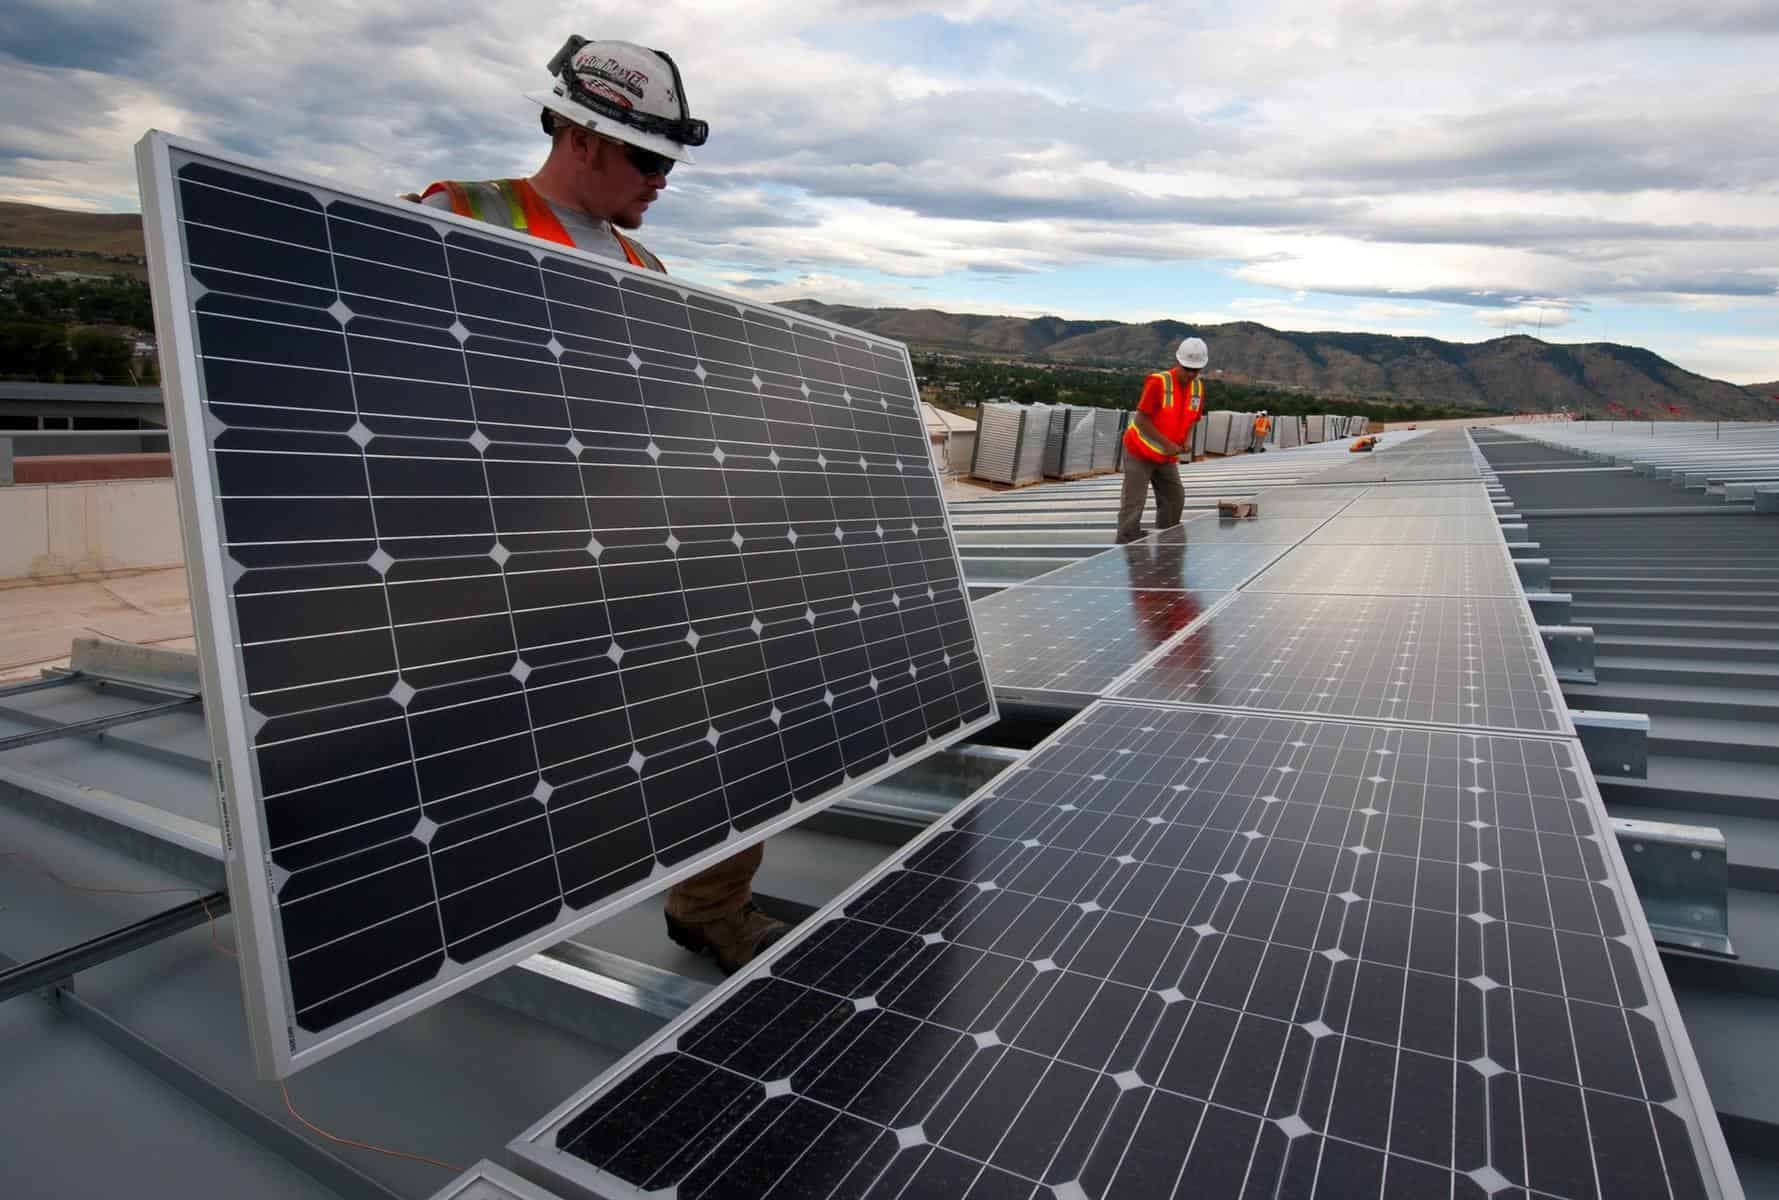 Automate solar power